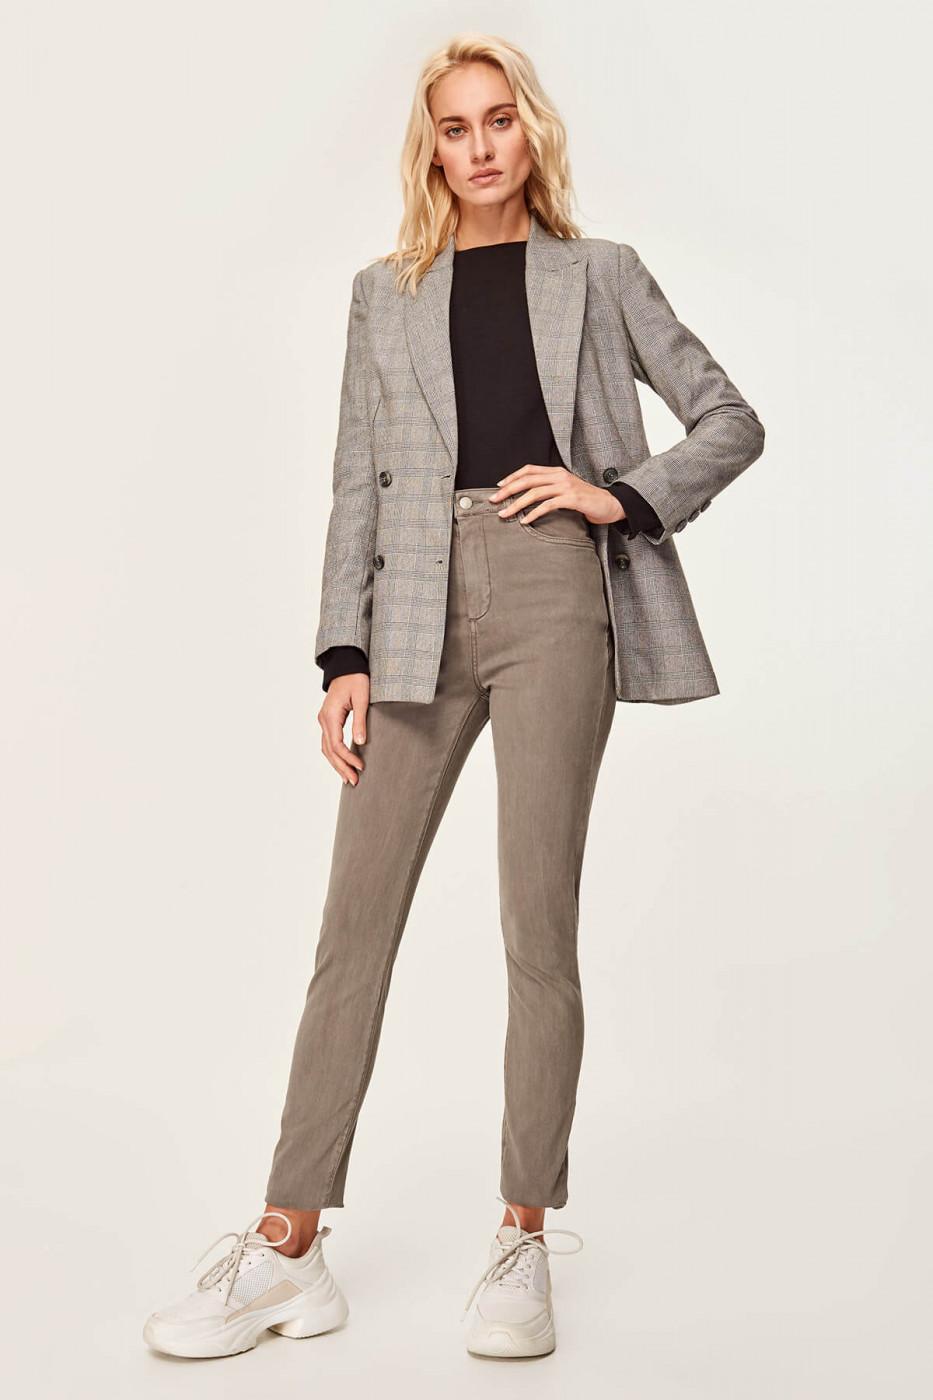 Trendyol Gray High Waist Skinny Jeans